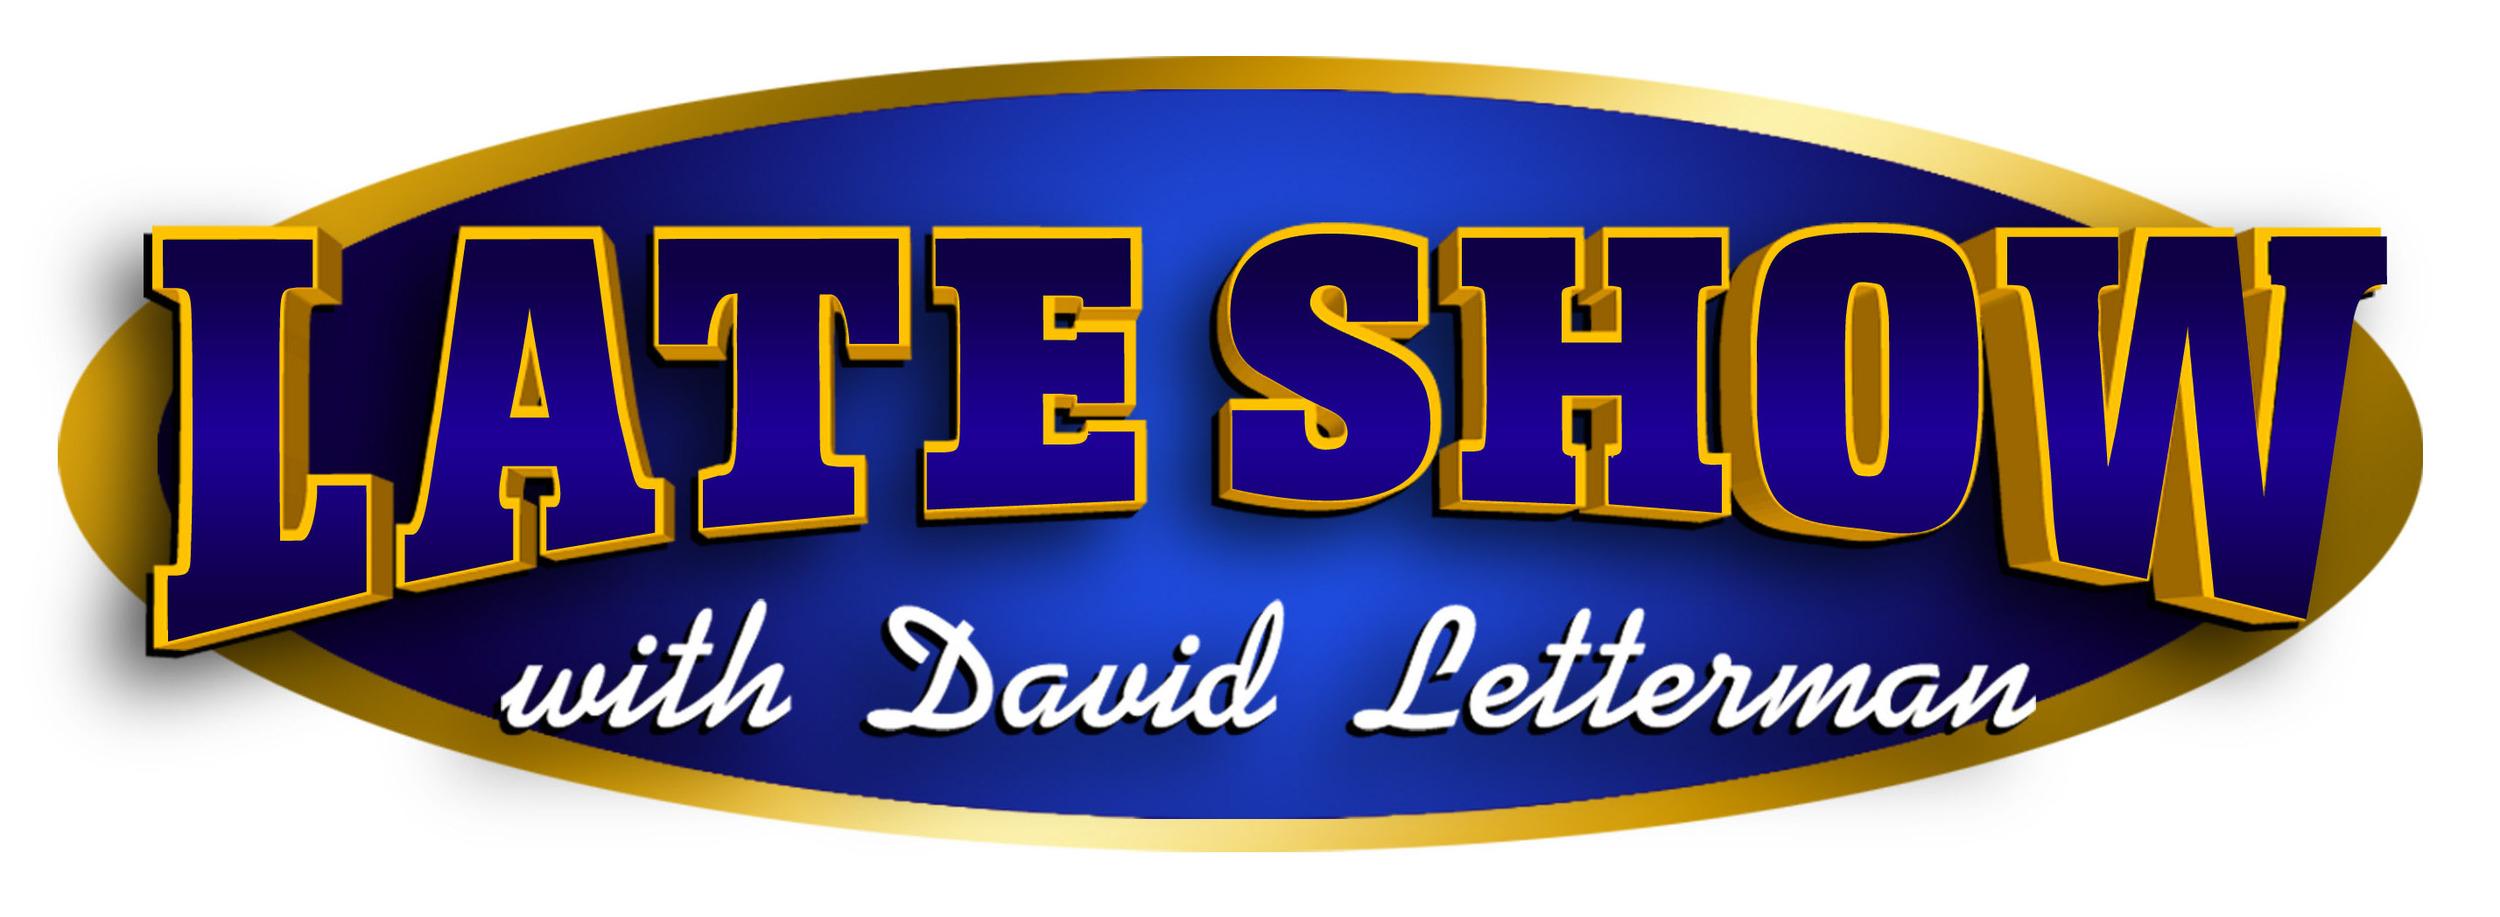 late-show-logo-for-print.jpg